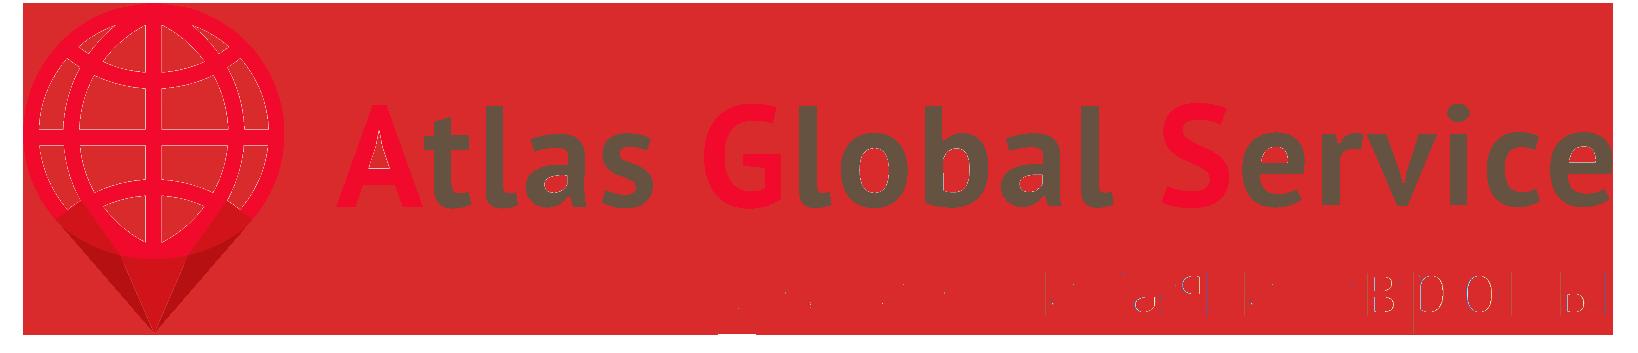 AGS-GLOBAL